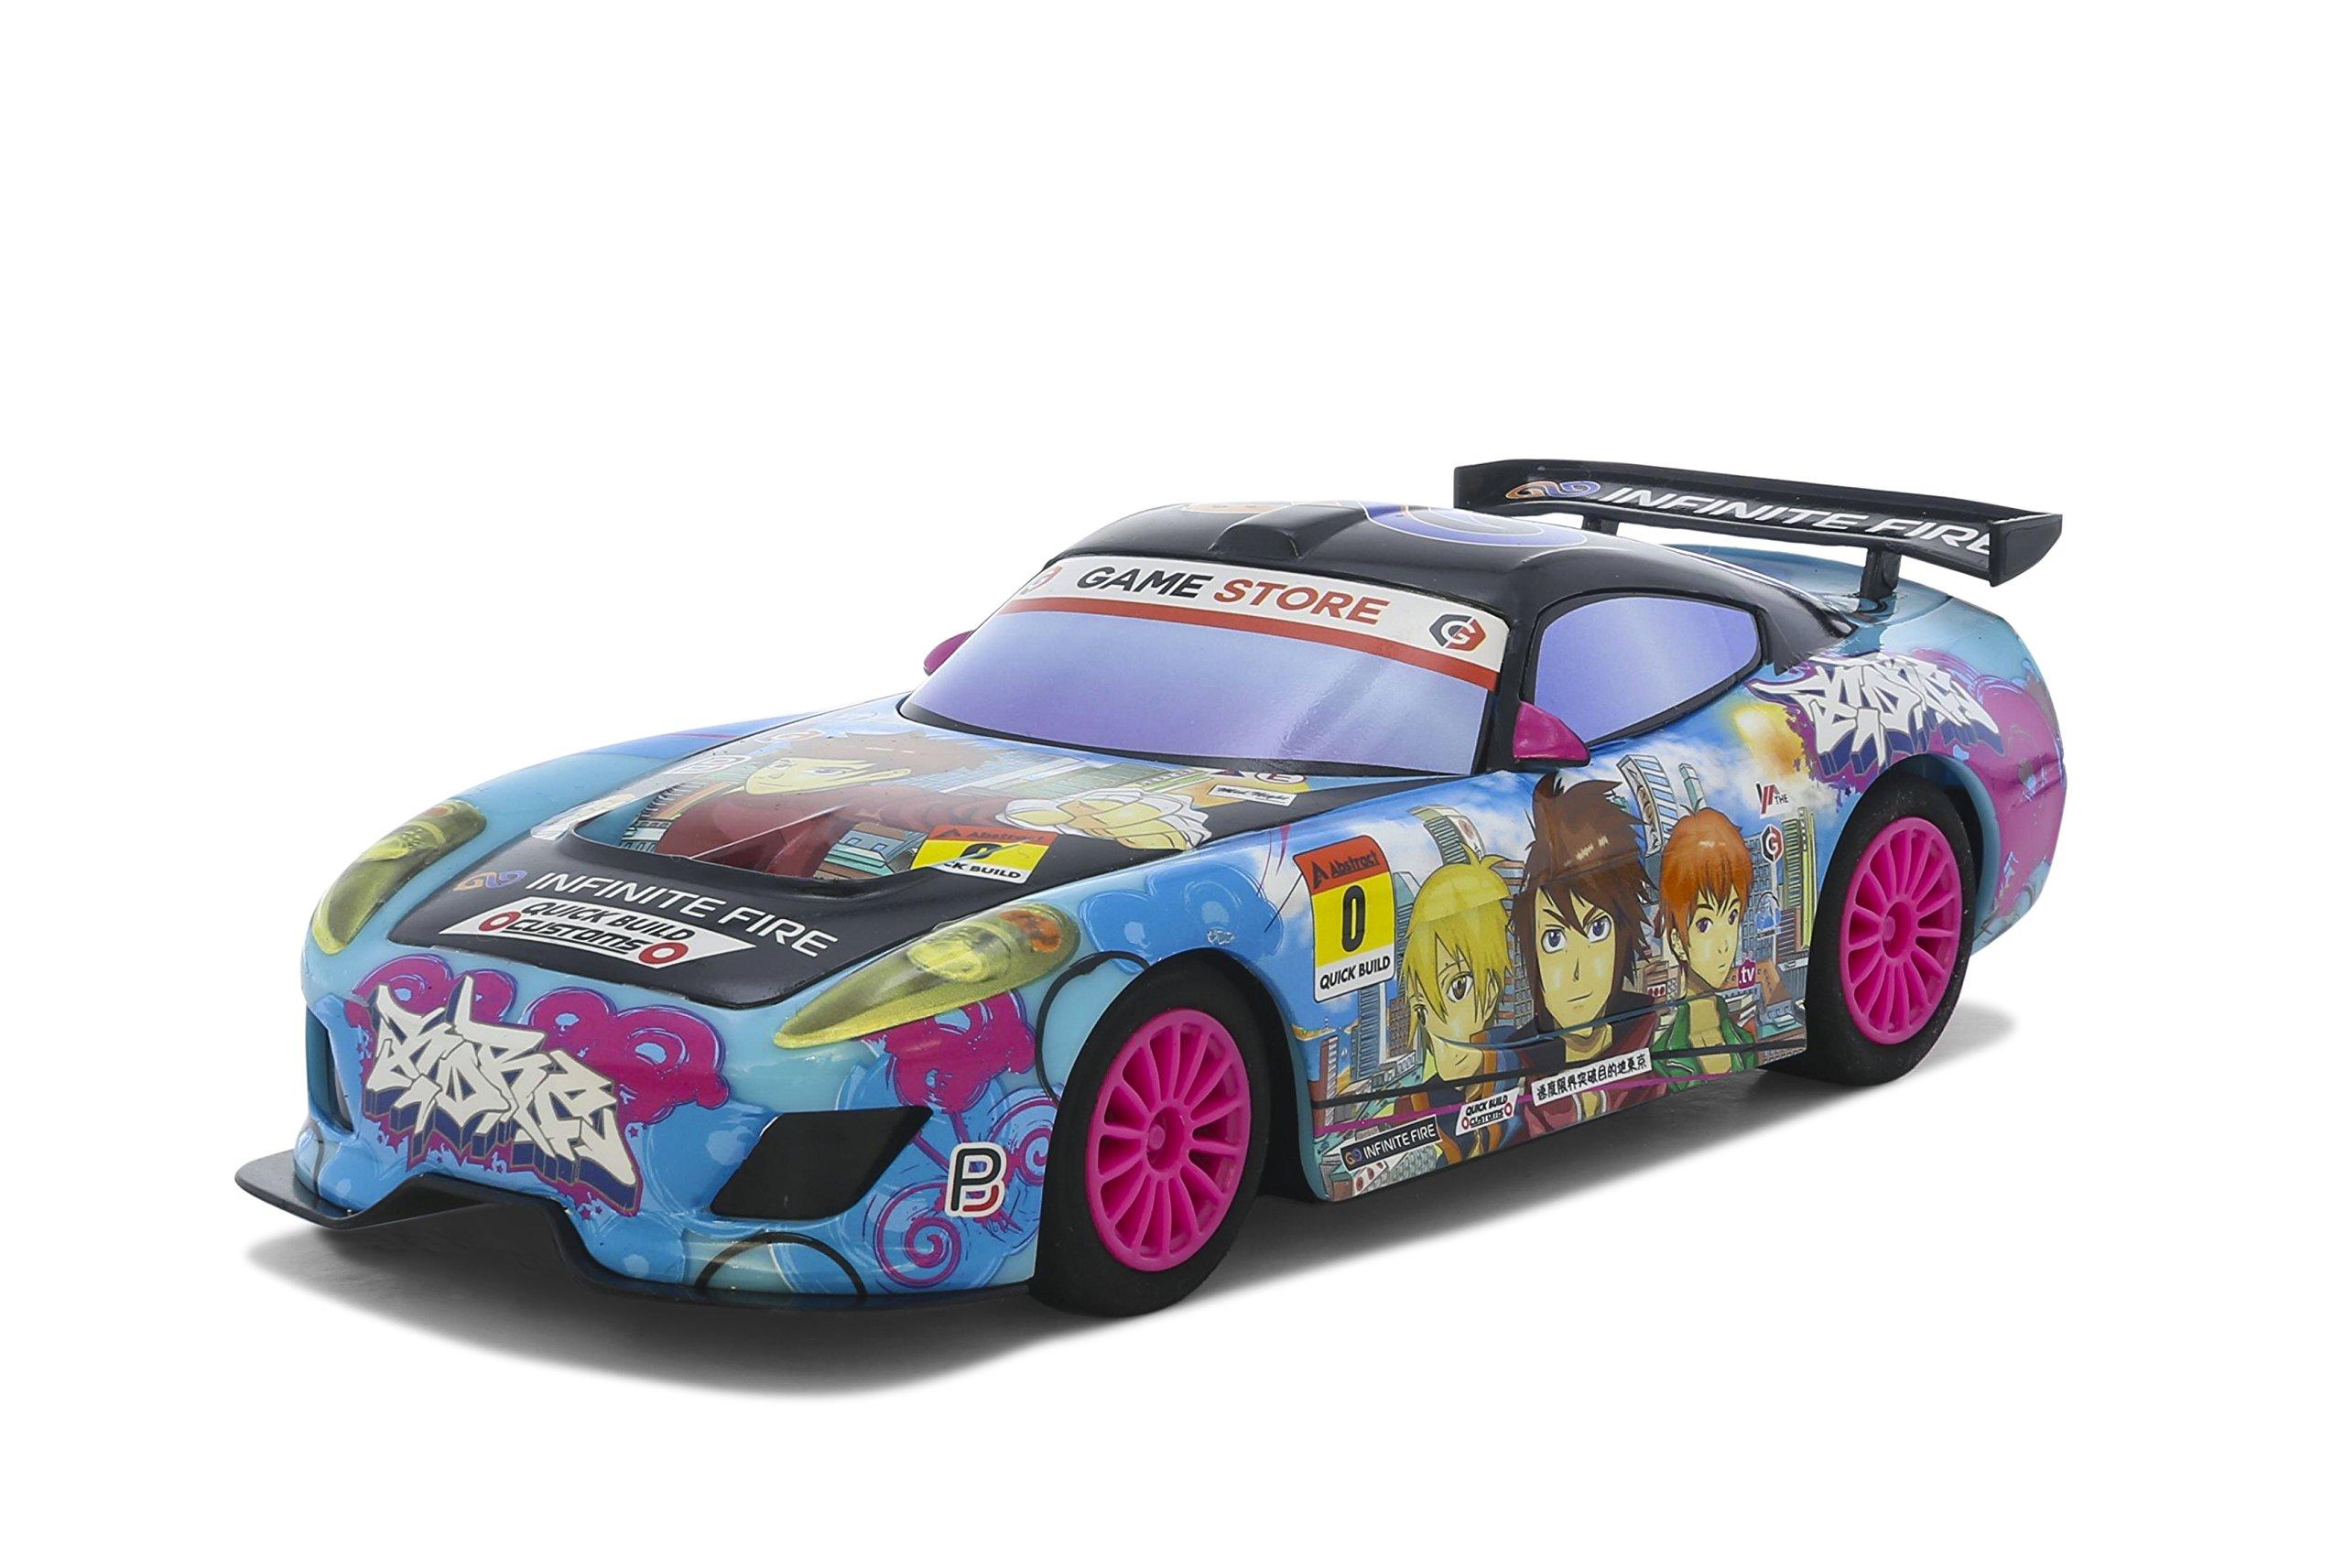 Scalextric Lightning Team Gt Anime Sunrise 1:32 Slot Car C3838 Vehicle Replica